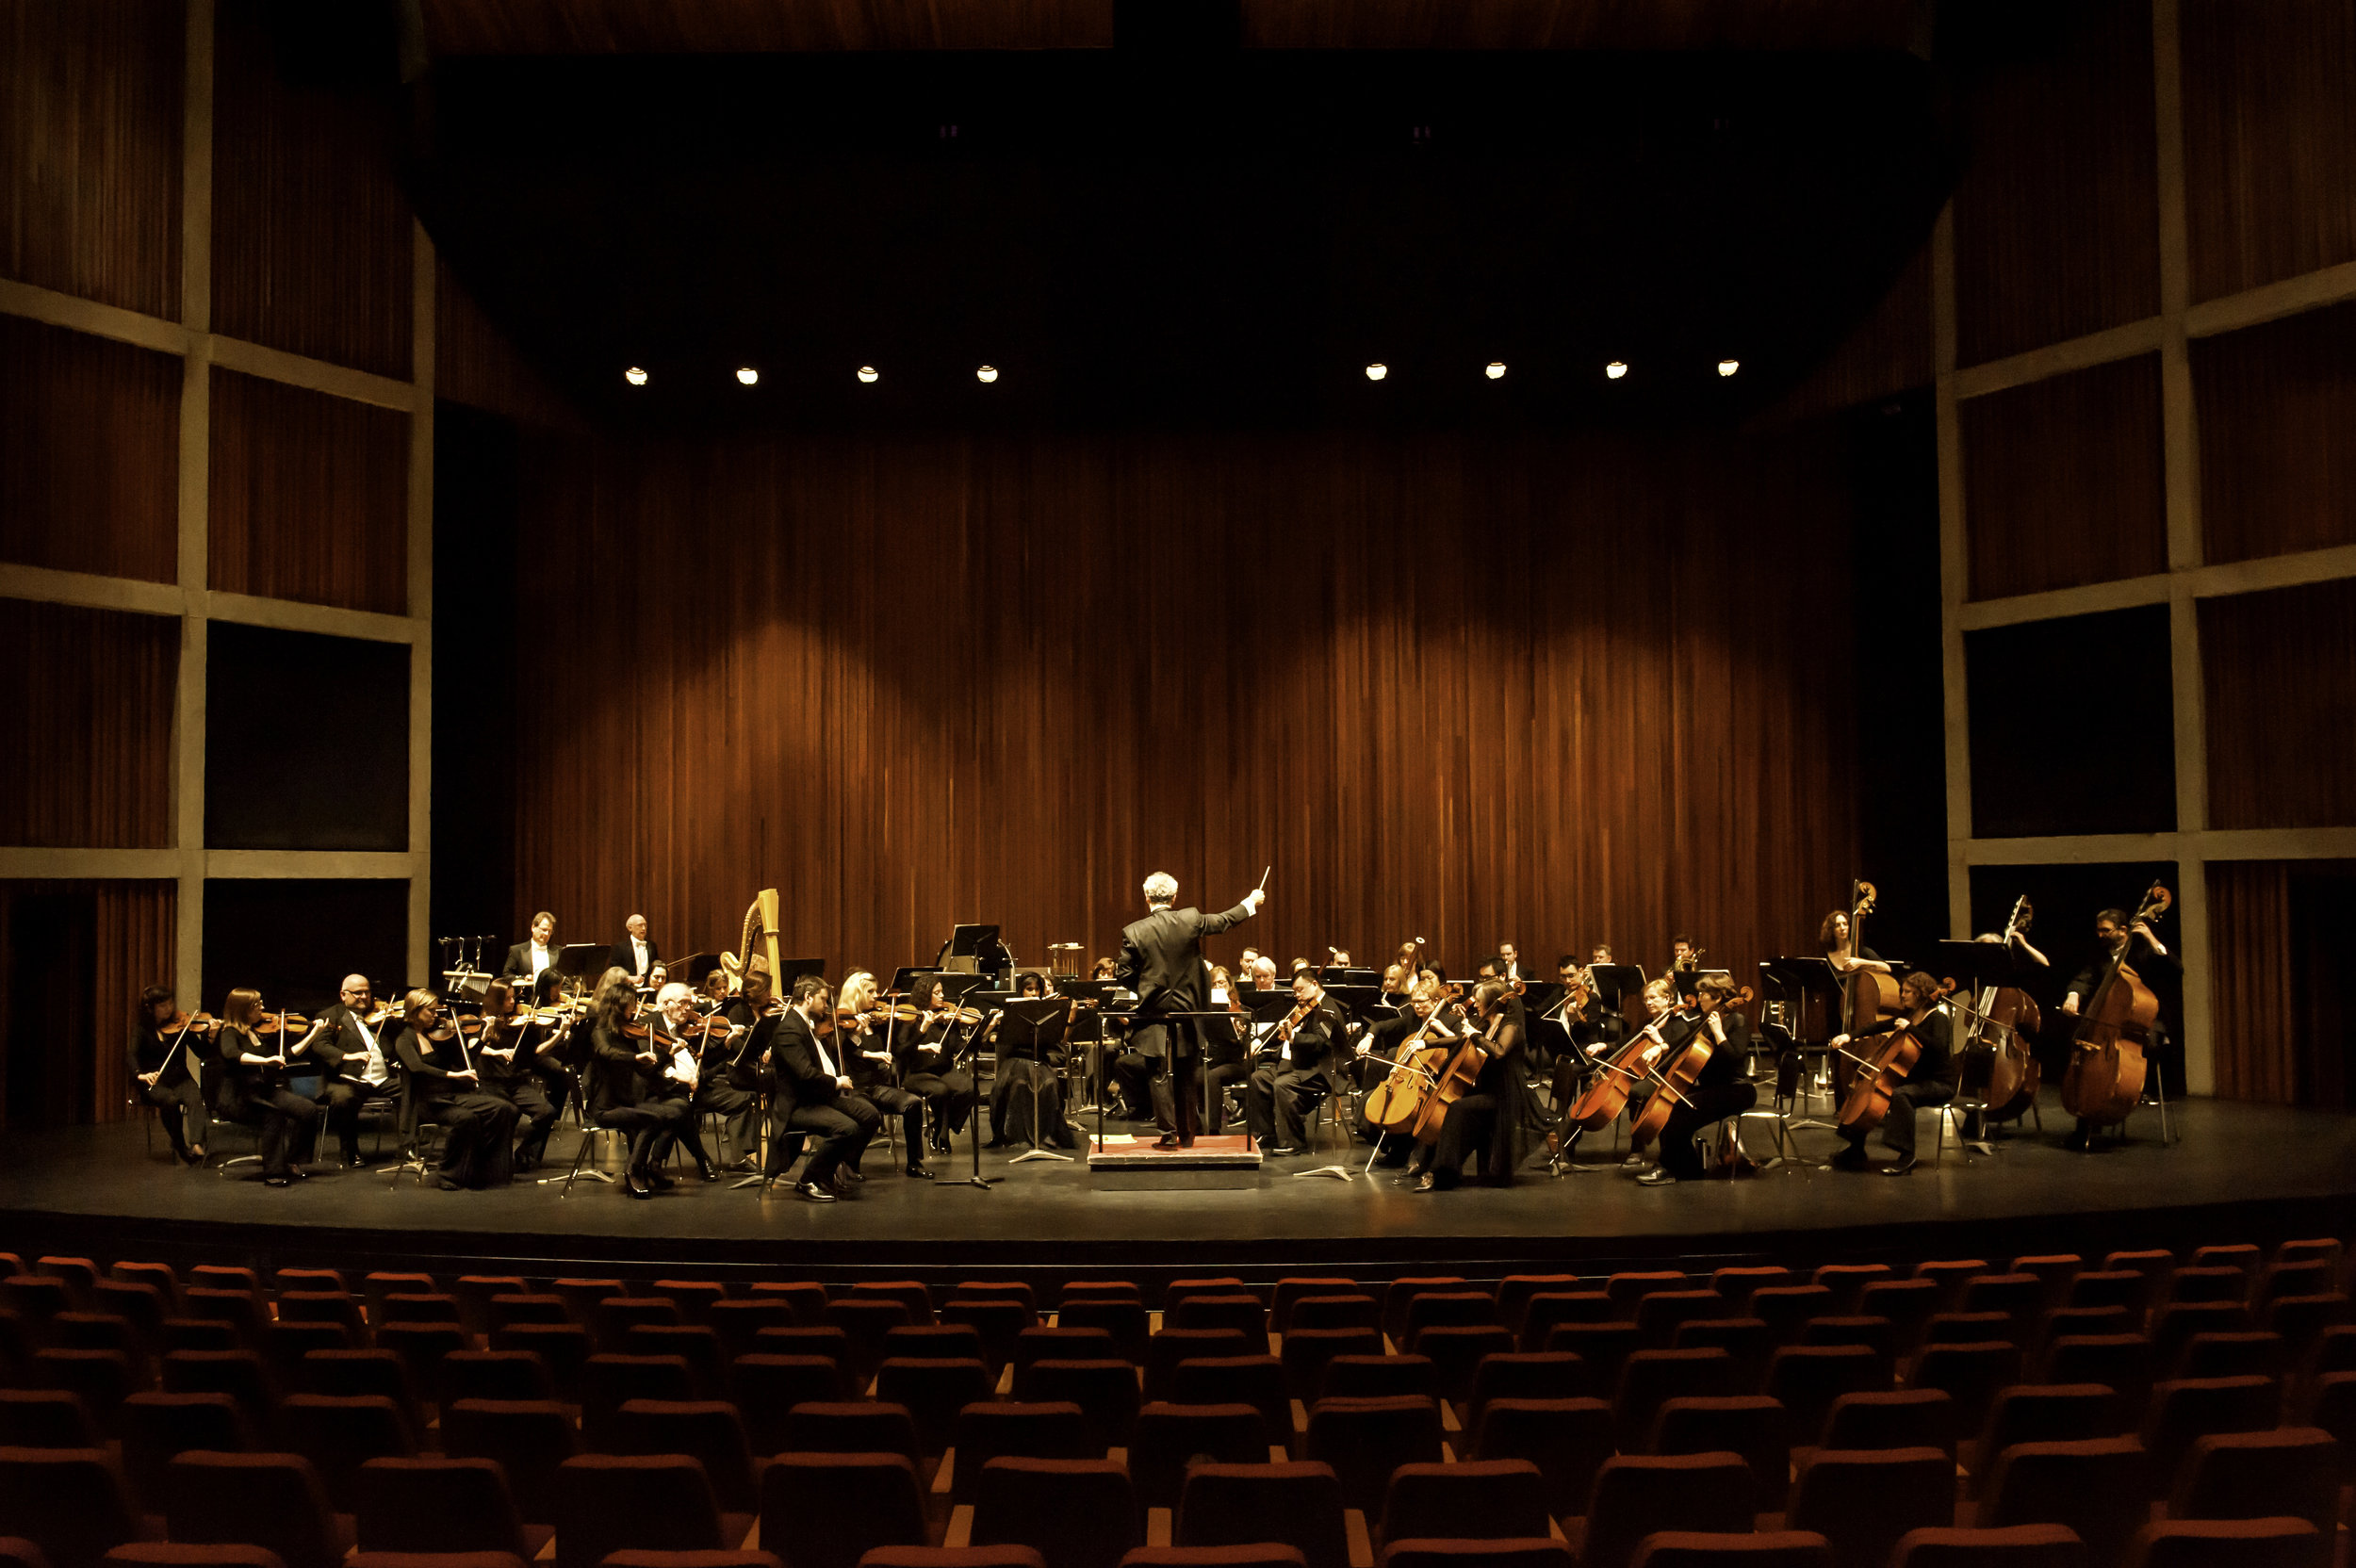 Marta-Hewson-editorial-portraits-Hamilton-Philharmonic-Orchestra.jpg